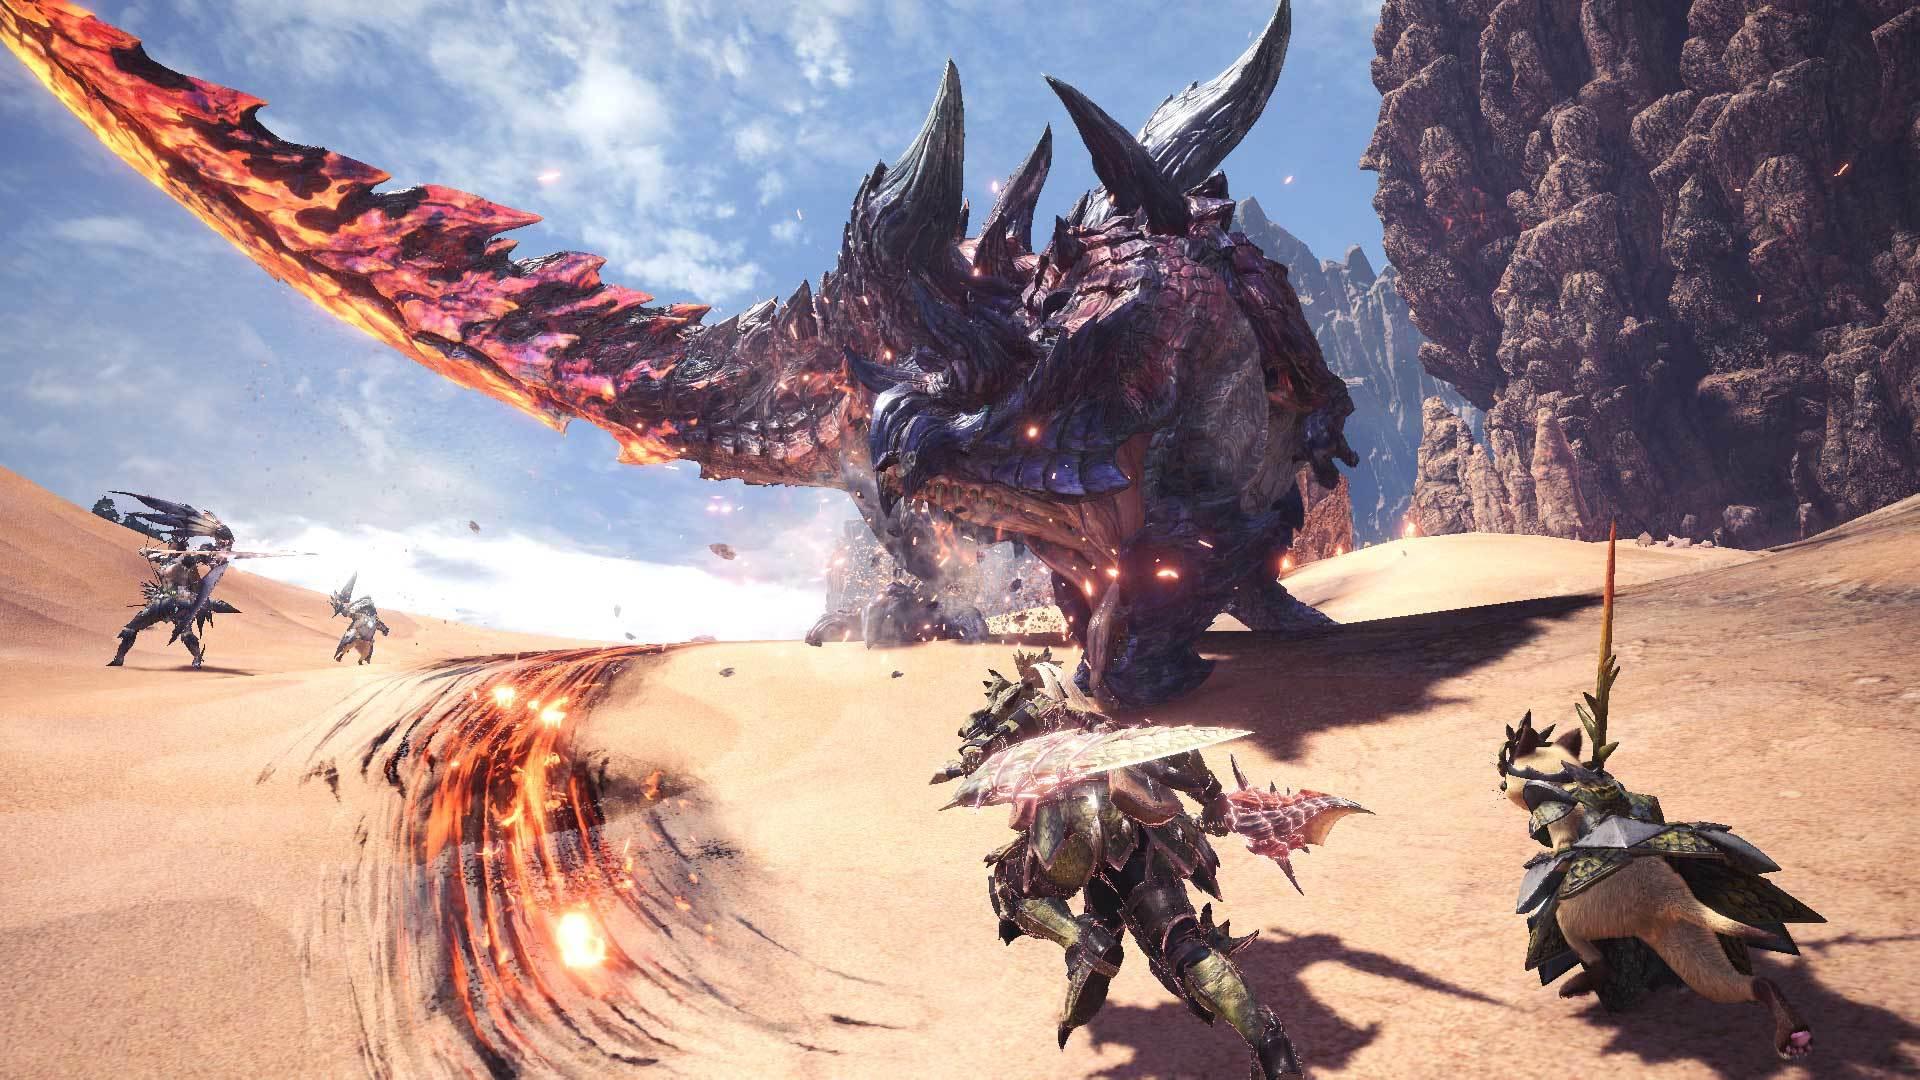 Imagen de Monster Hunter: World triplicó las expectativas de venta de Capcom